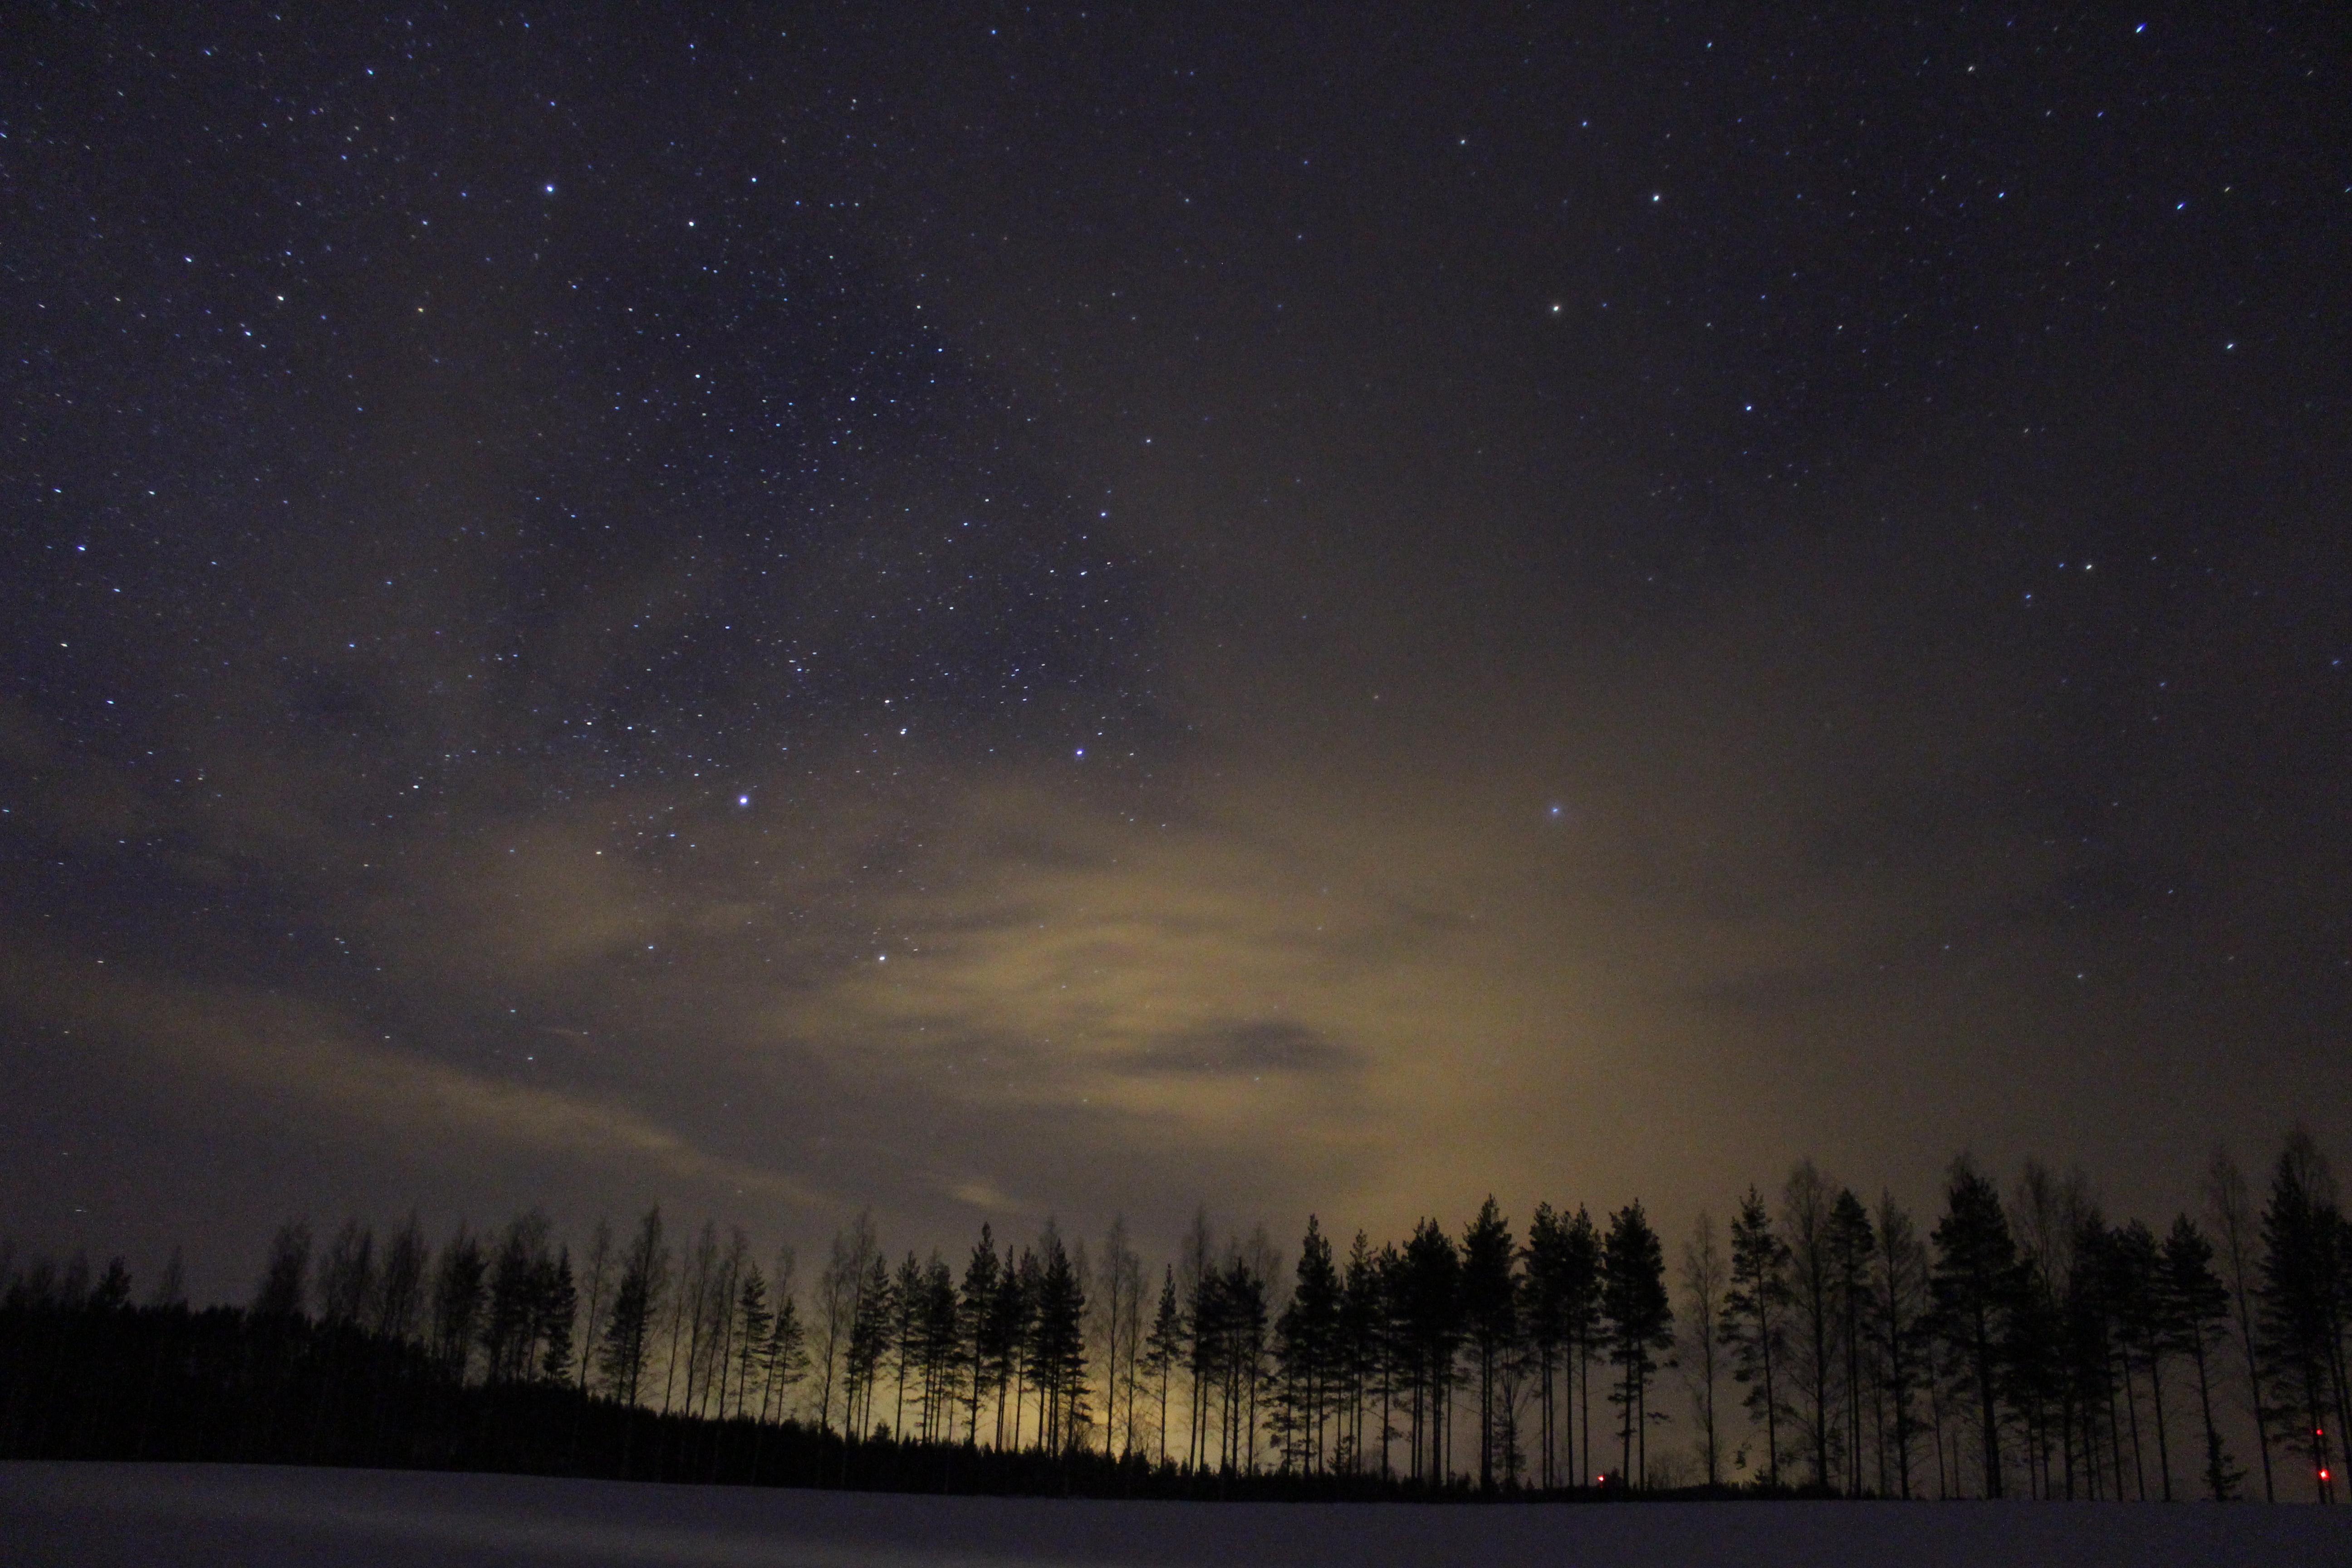 Night Sky And Light Pollution By Antza2 On DeviantArt